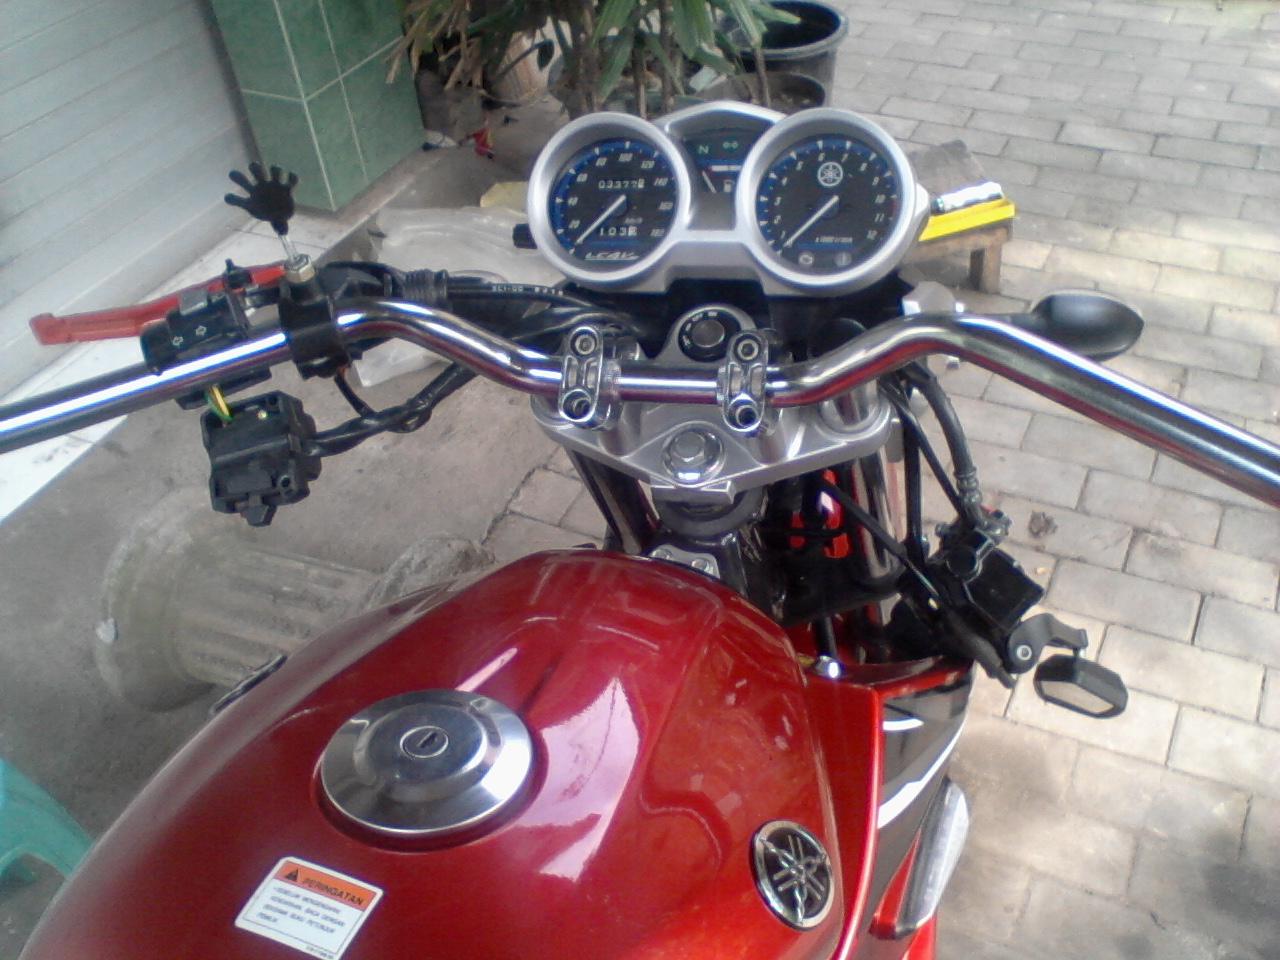 Motor Vixion Modifikasi Stang Tinggi Terkeren Glugu Tiger Revo Satrio Bimowibowo Ganti Dengan Ninja R